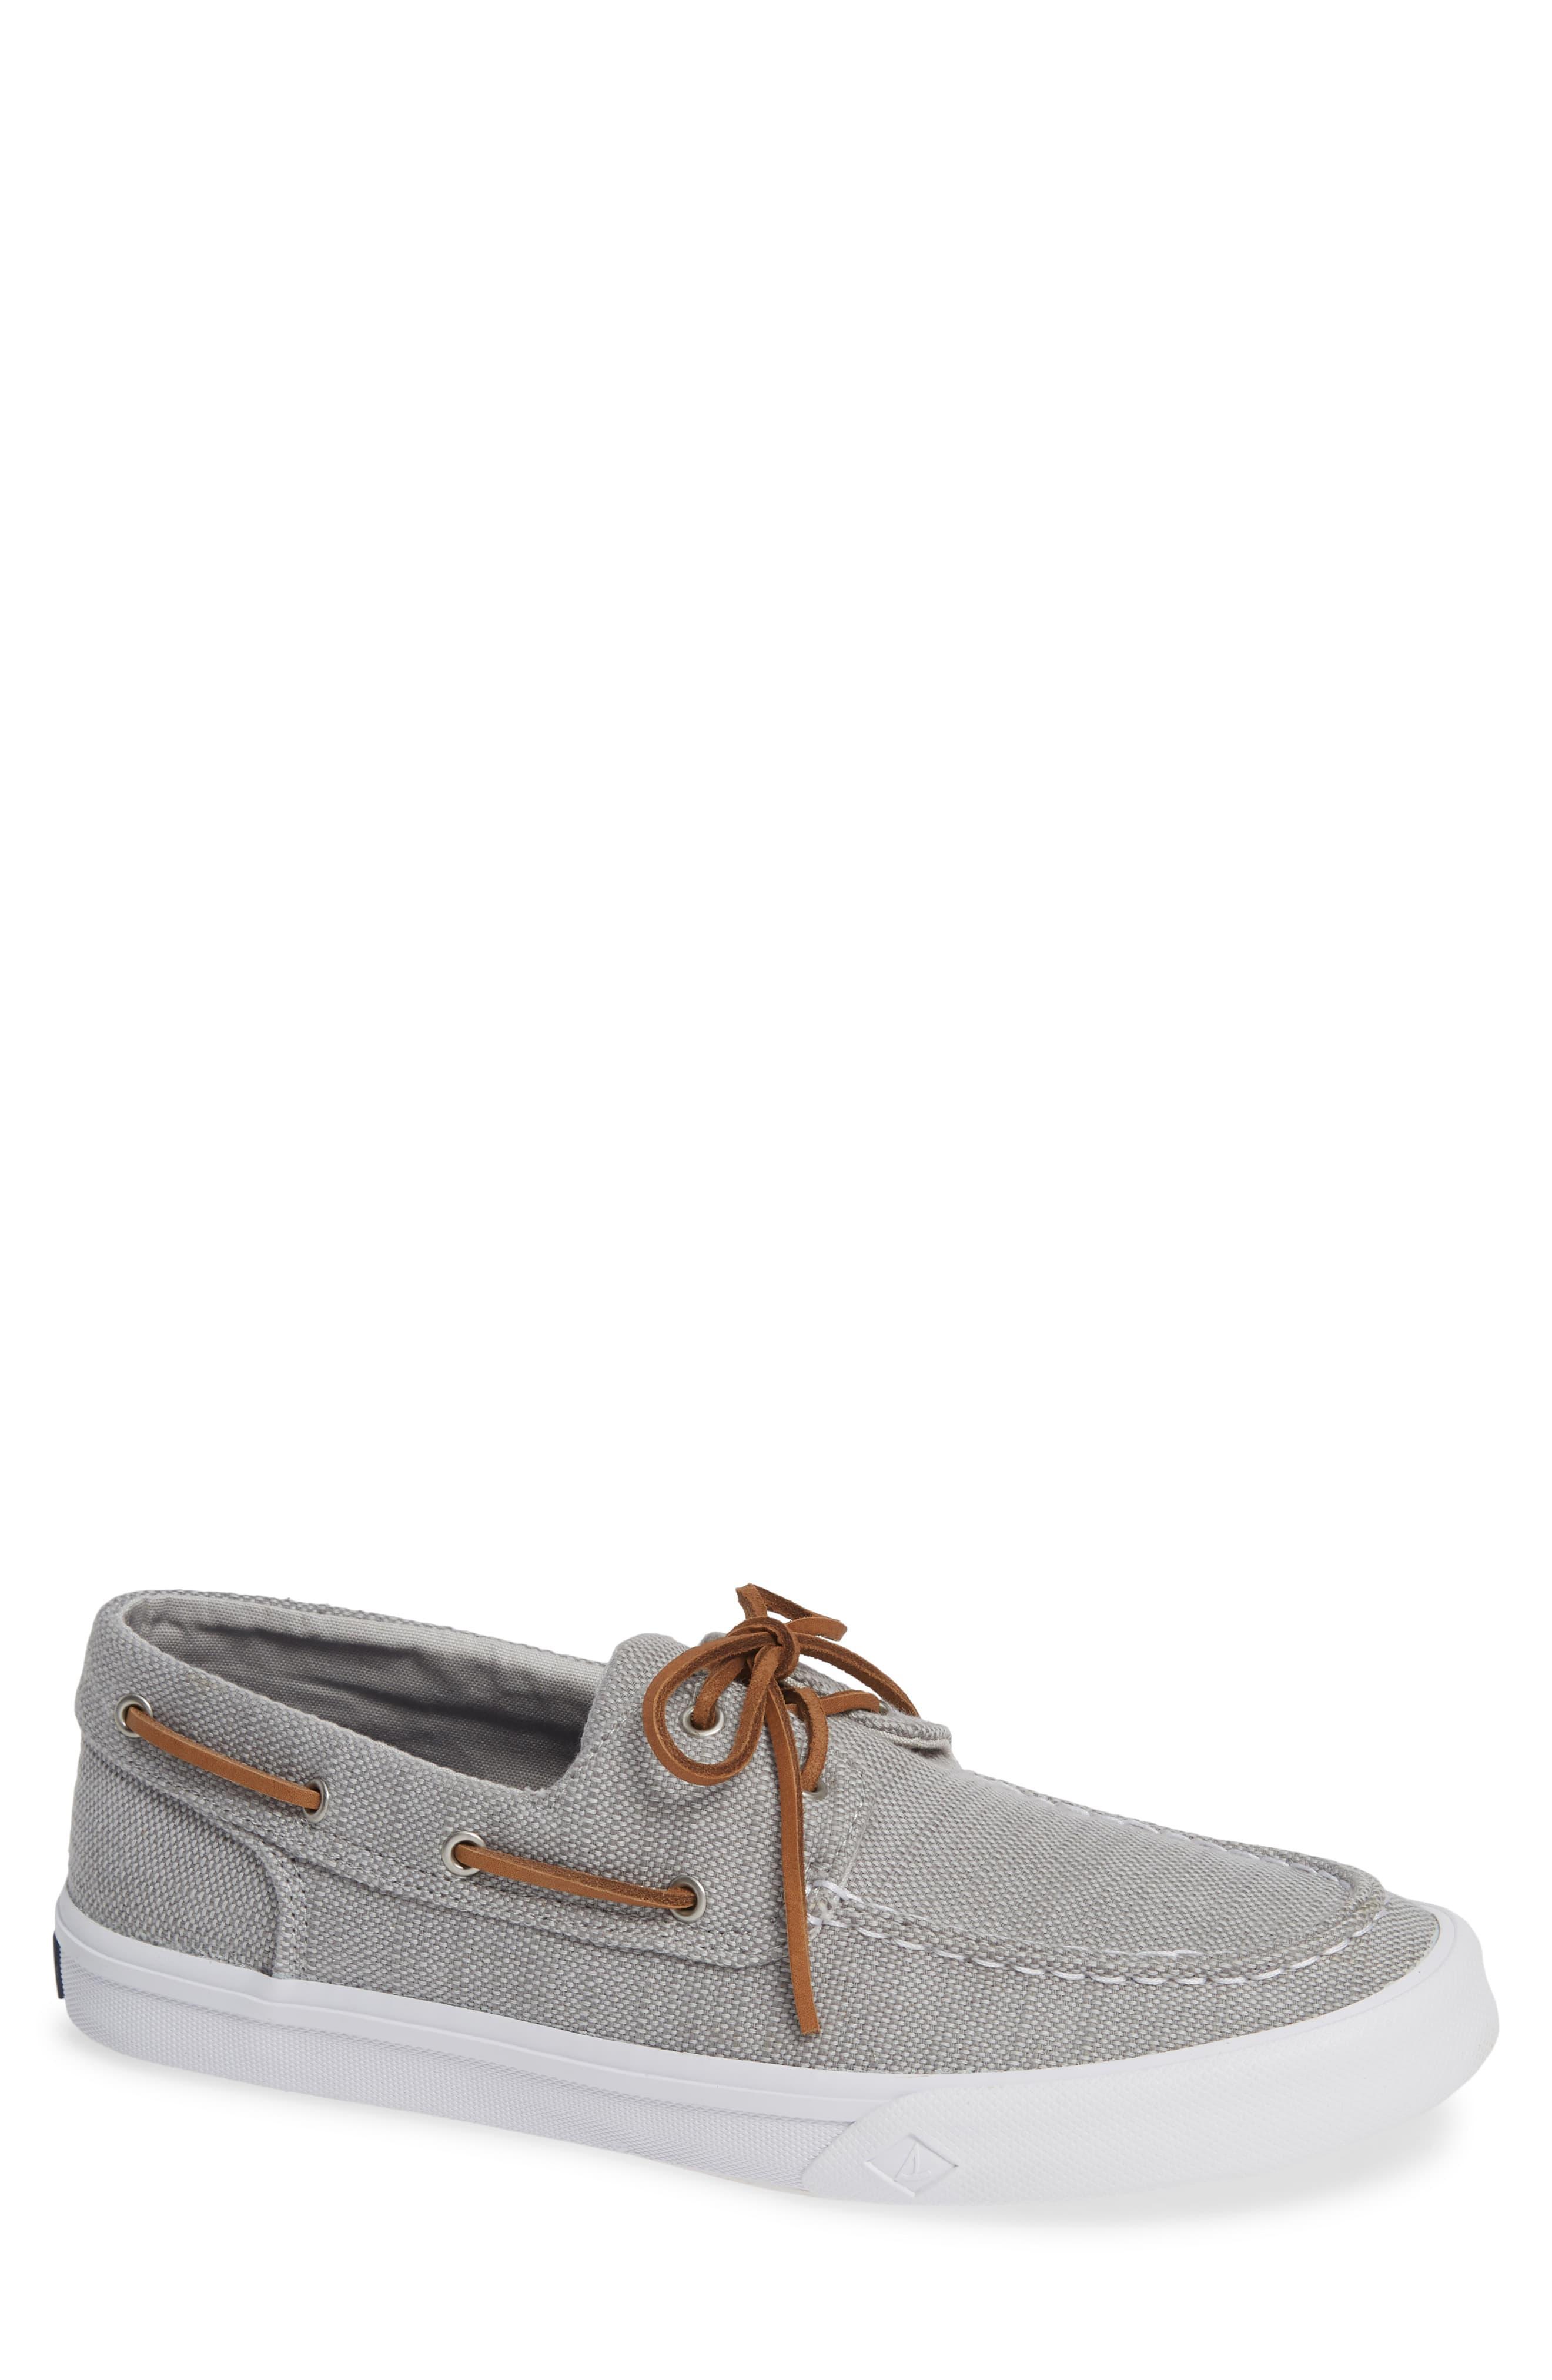 cb4cb50e92e2 Men's Sperry Bahama Ii Baja Boat Shoe, Size 11.5 M - Grey | Products ...